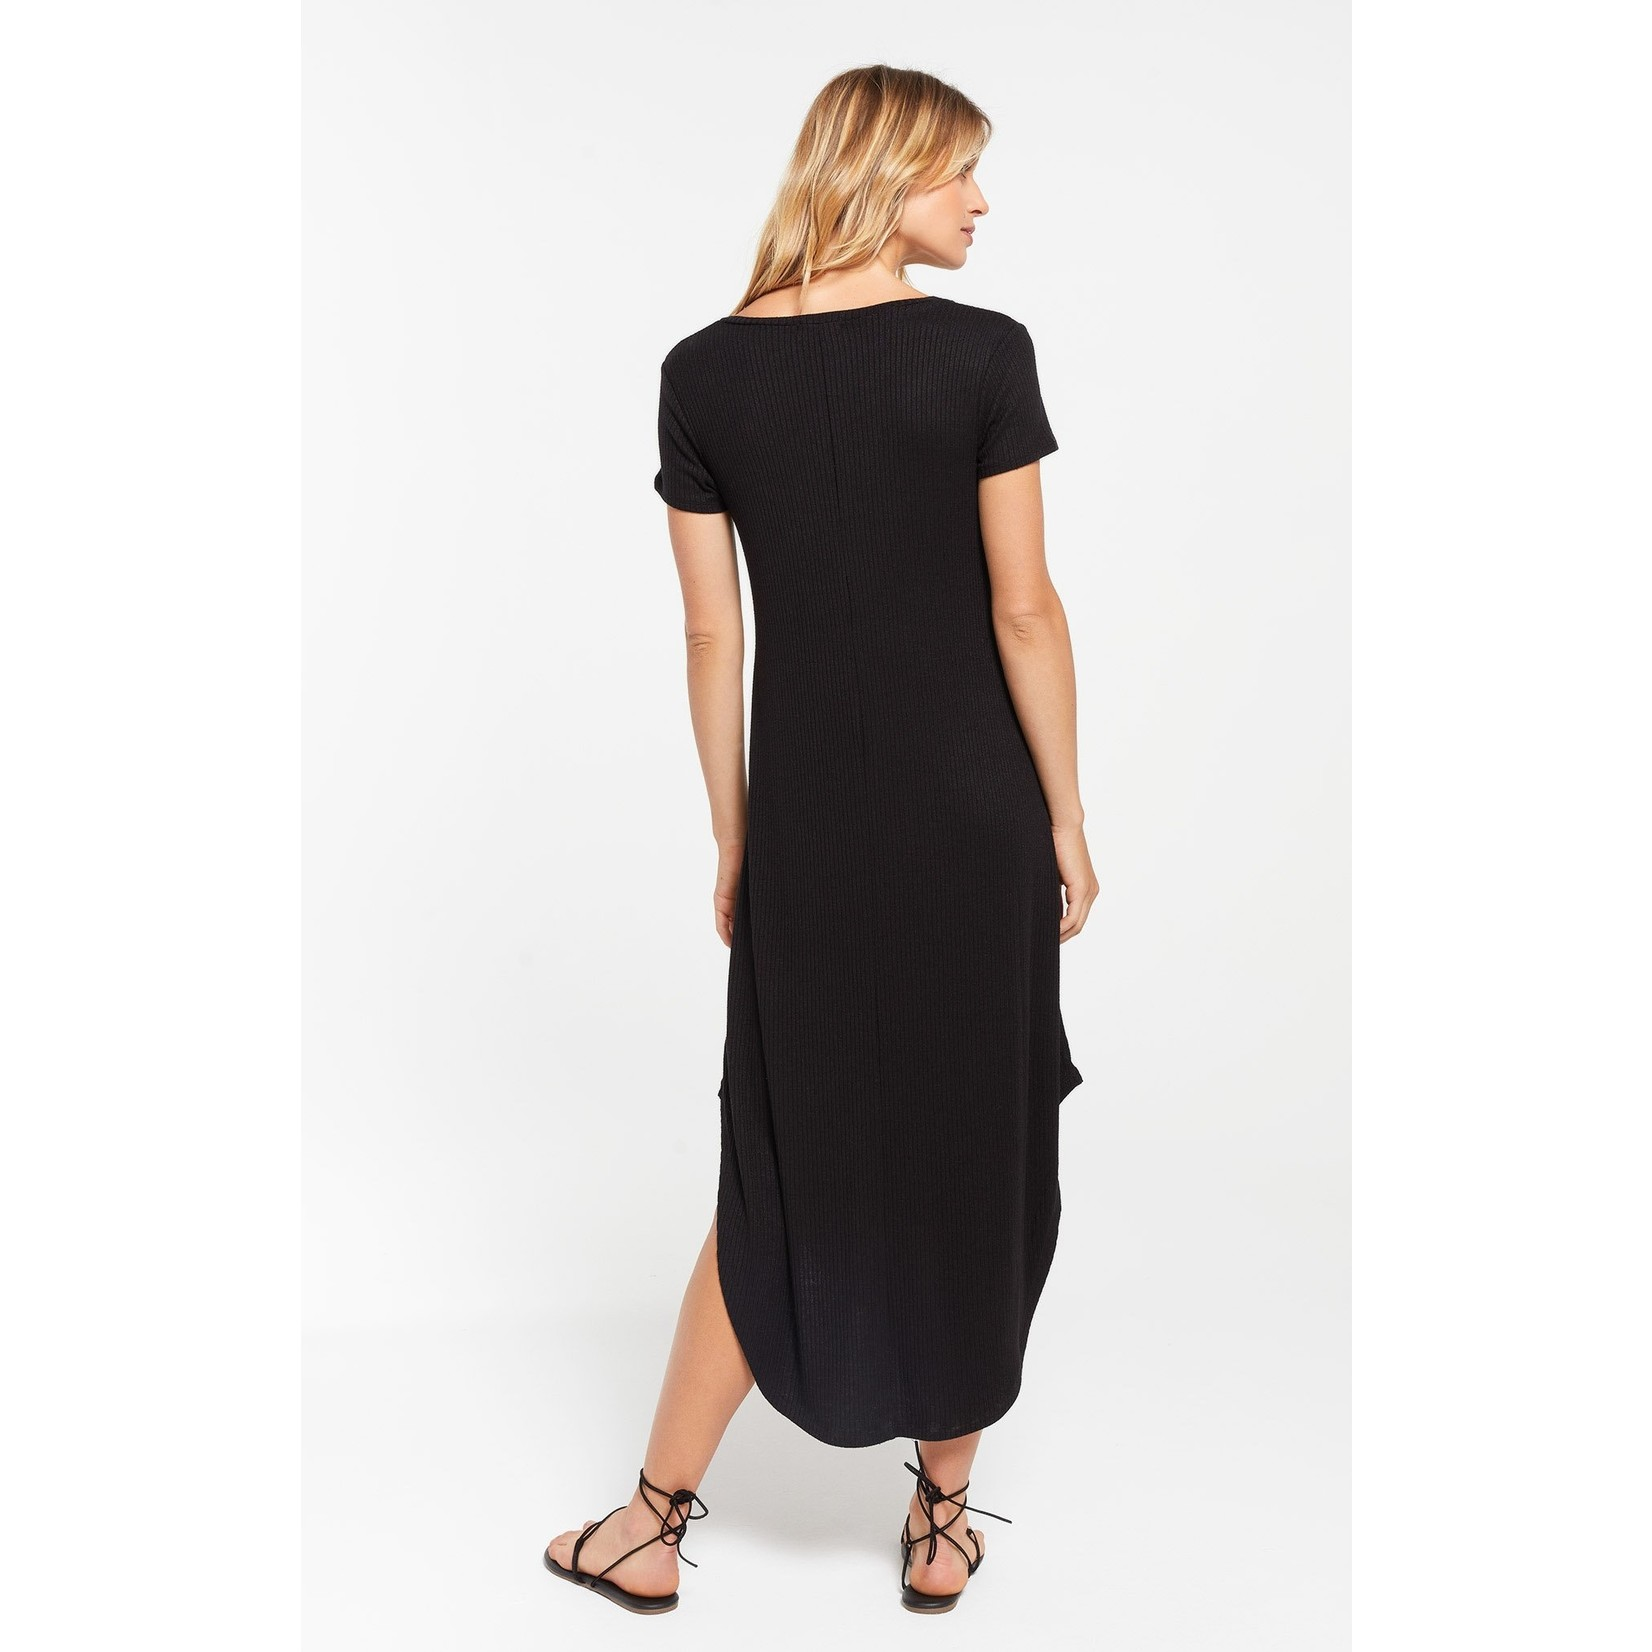 Z Supply Reverie Rib Dress - Black